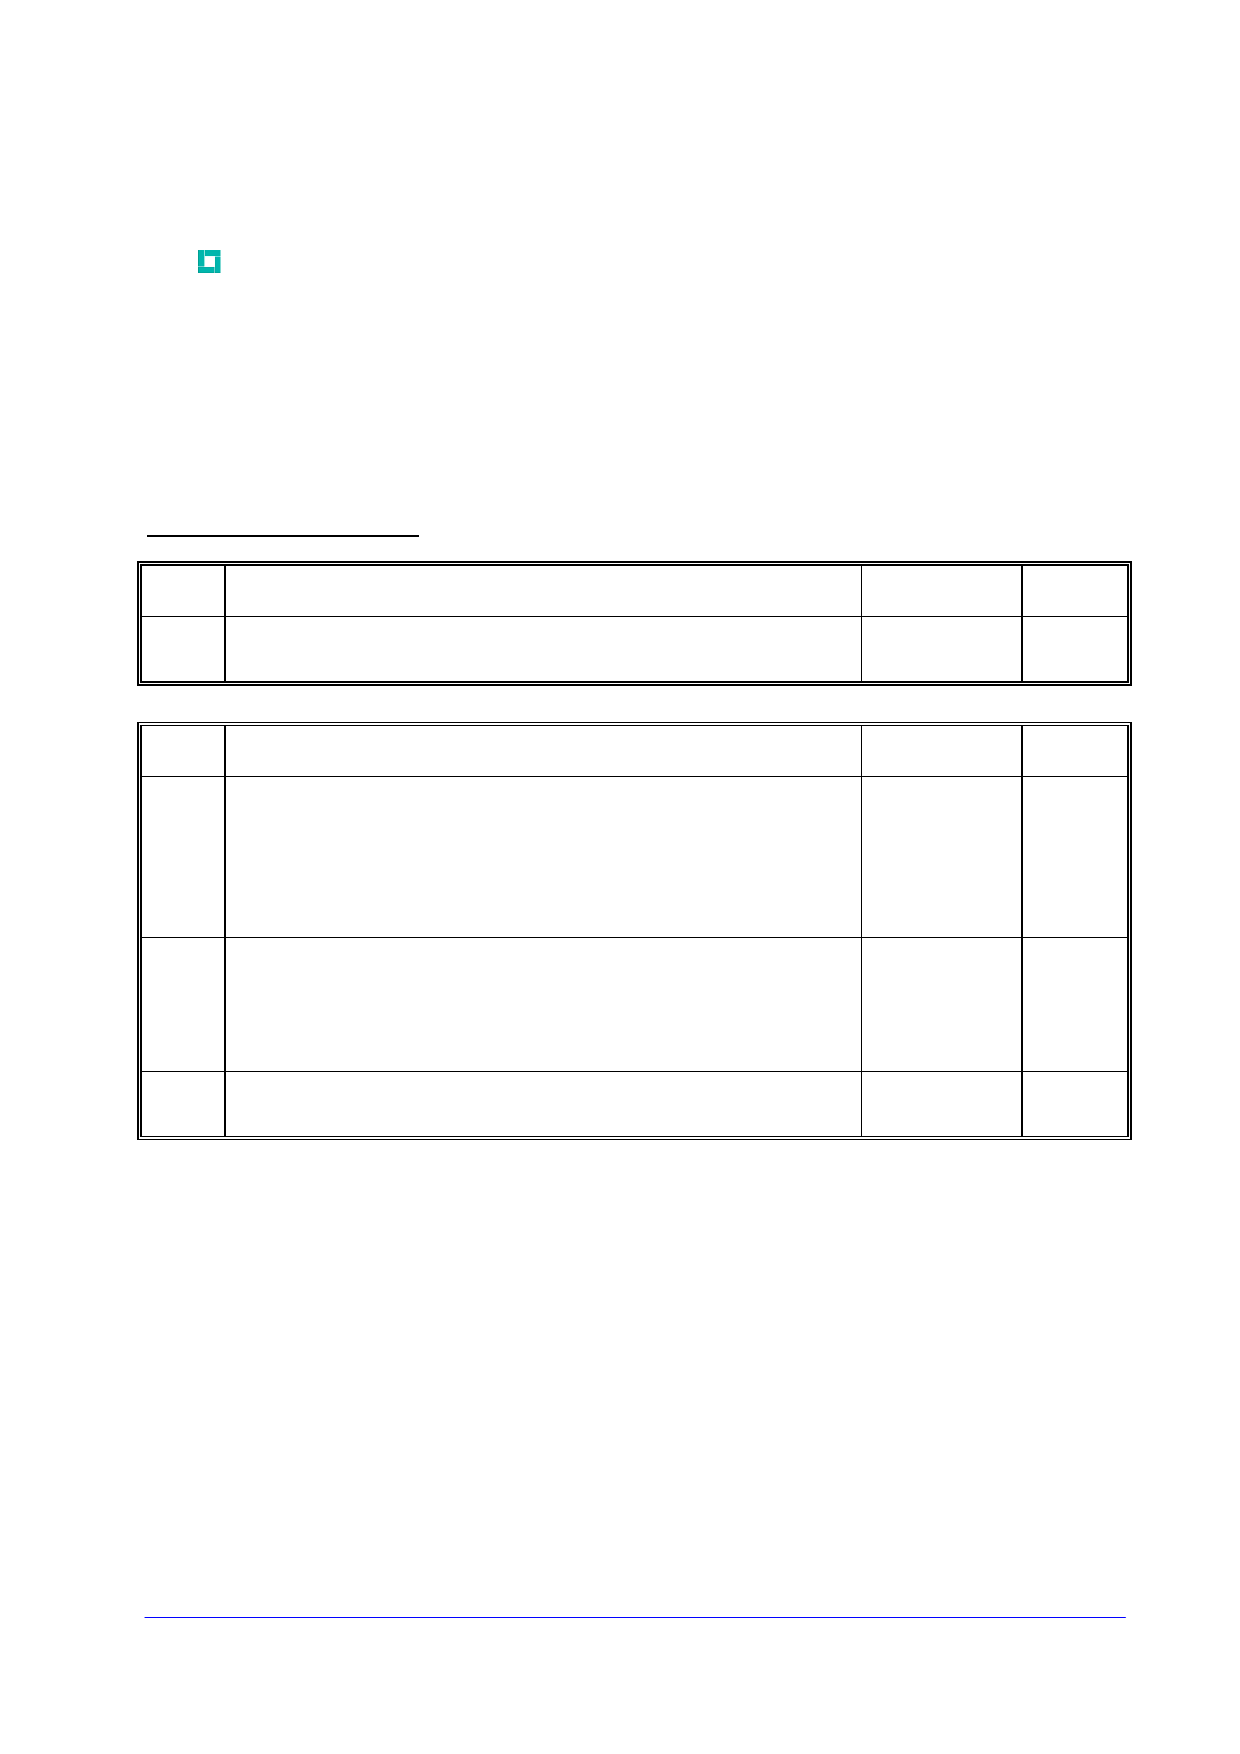 M0659LC440 دیتاشیت PDF